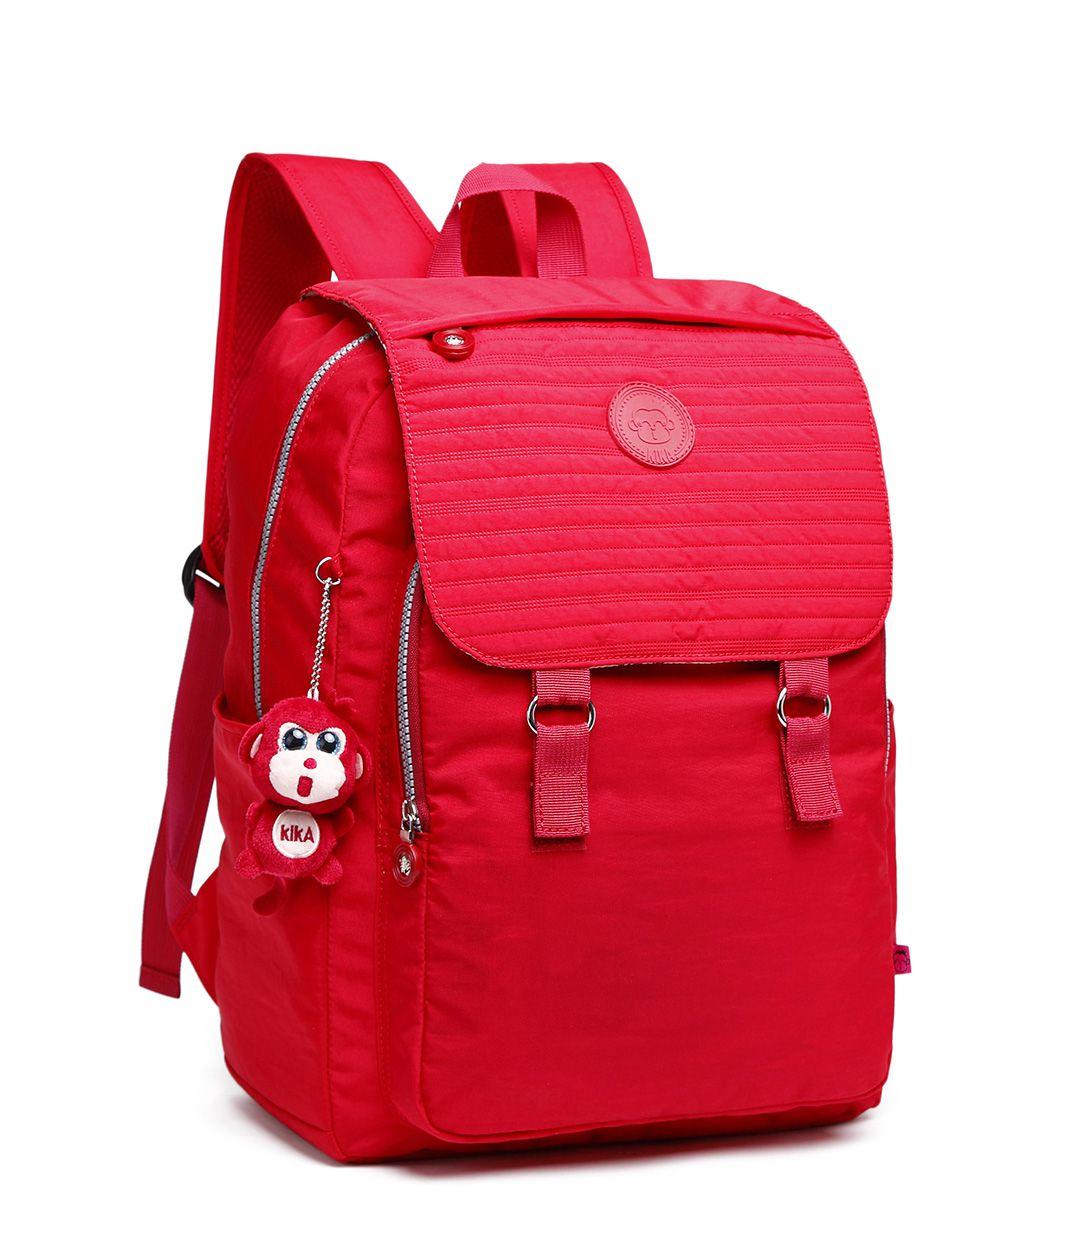 Mochila Feminina Kika Escolar Laptop Fashion KK252 Vermelho